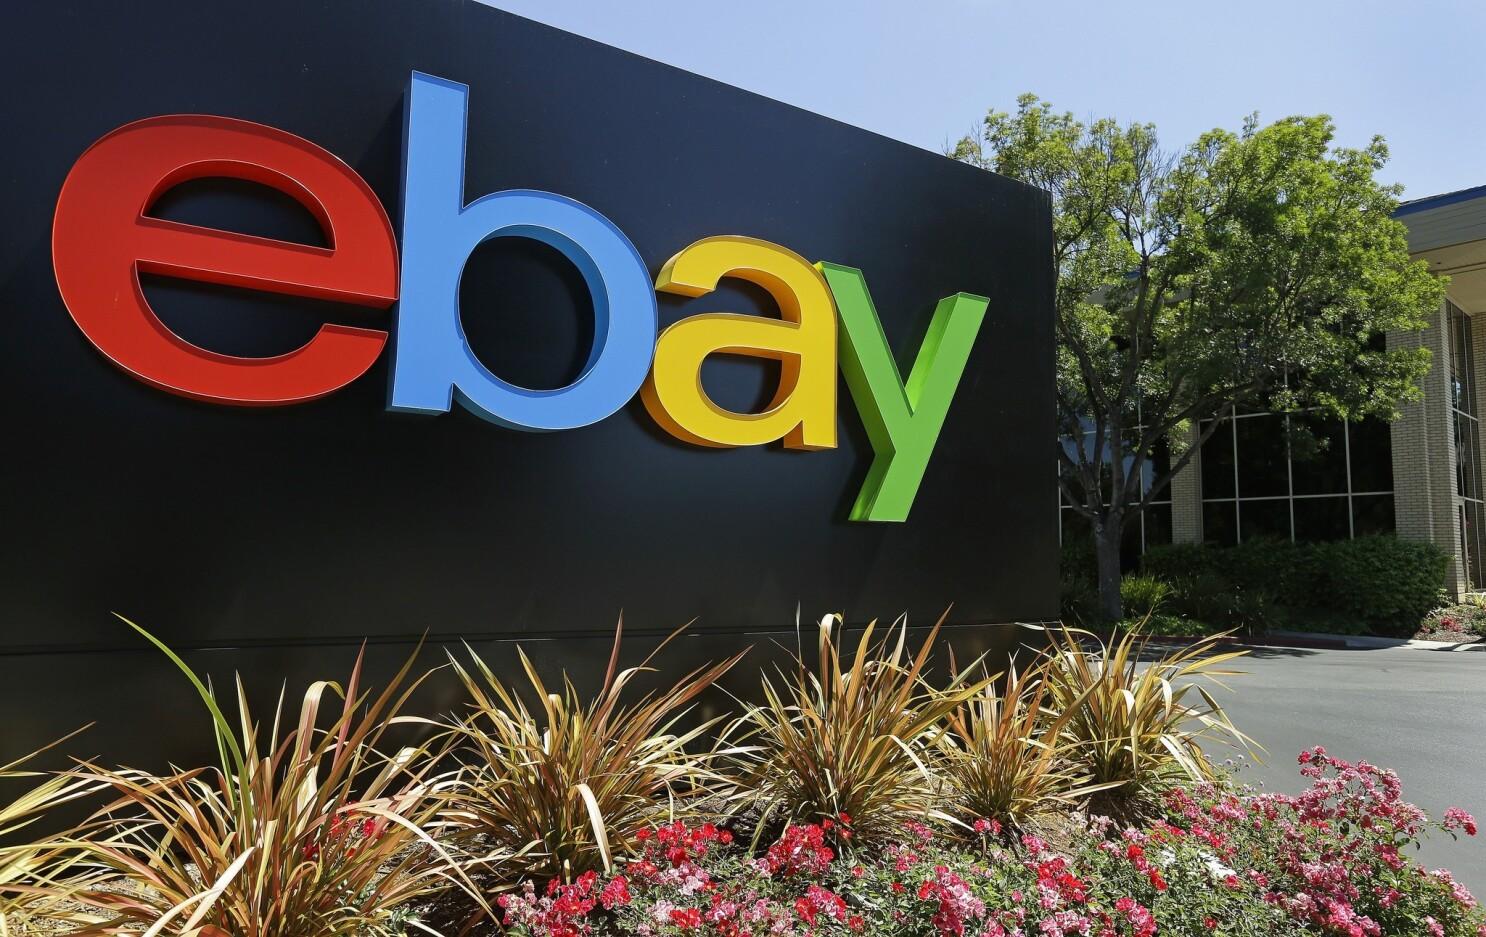 Ebay Bans Masks And Hand Sanitizer After Coronavirus Price Gouging Los Angeles Times